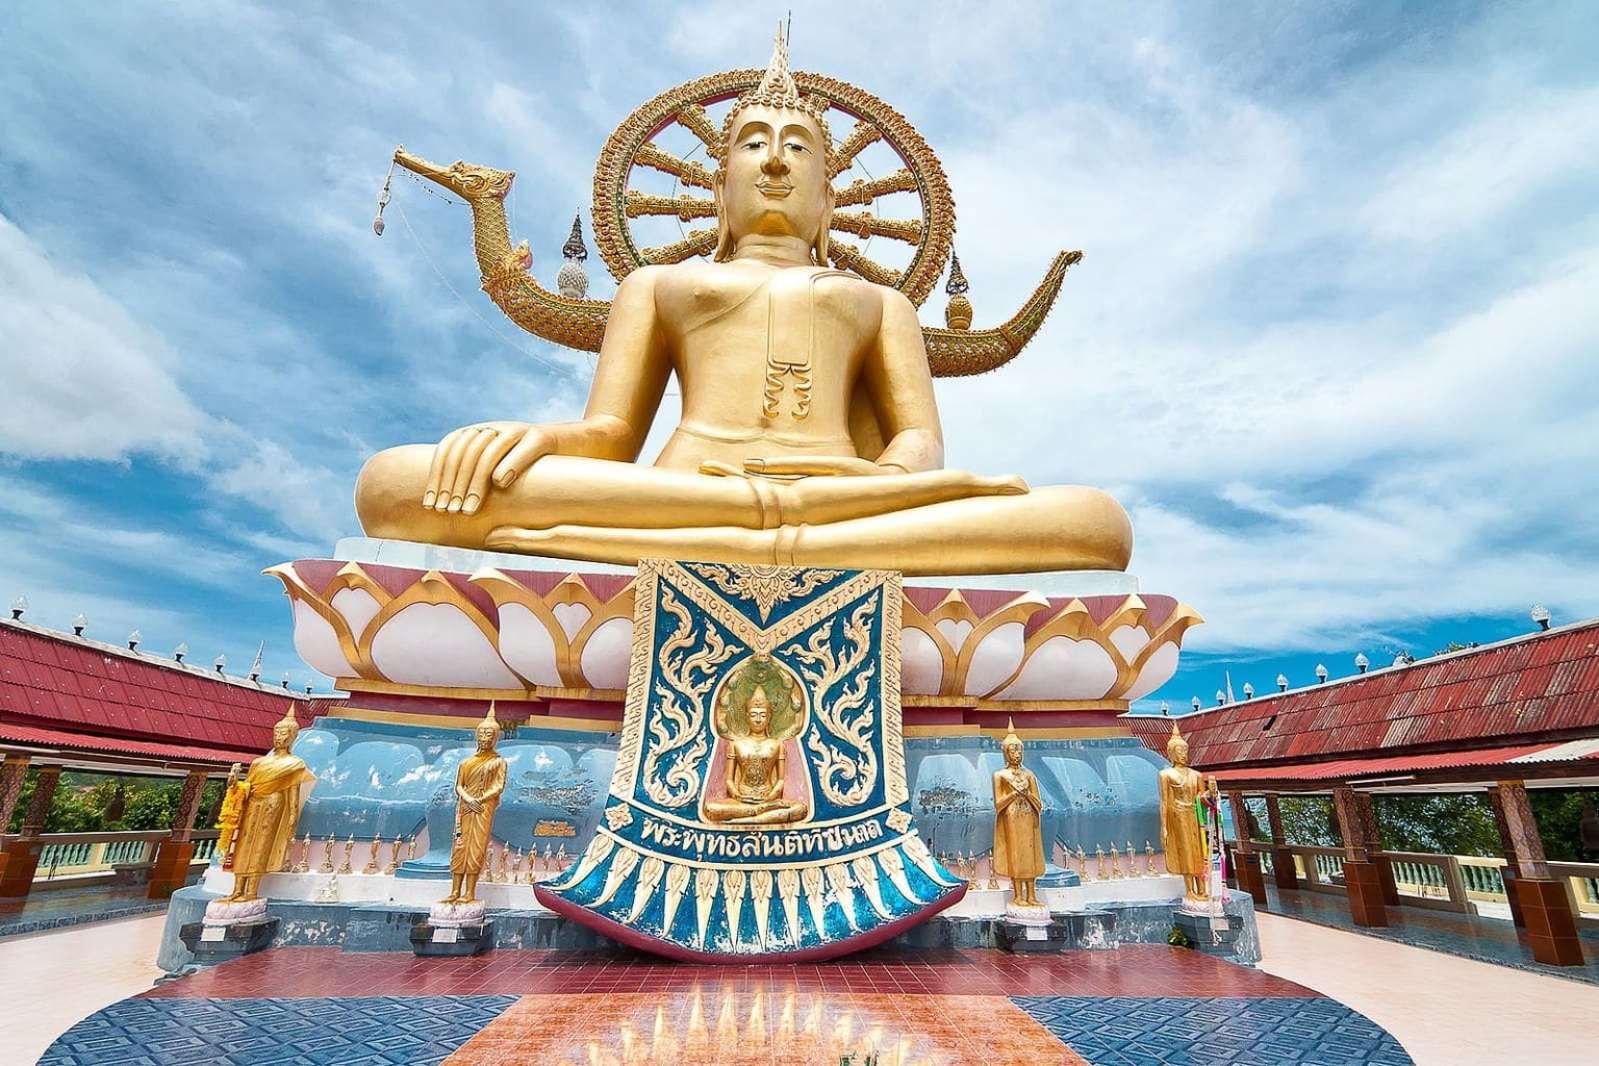 Big Buddha at Wat Phra Yai